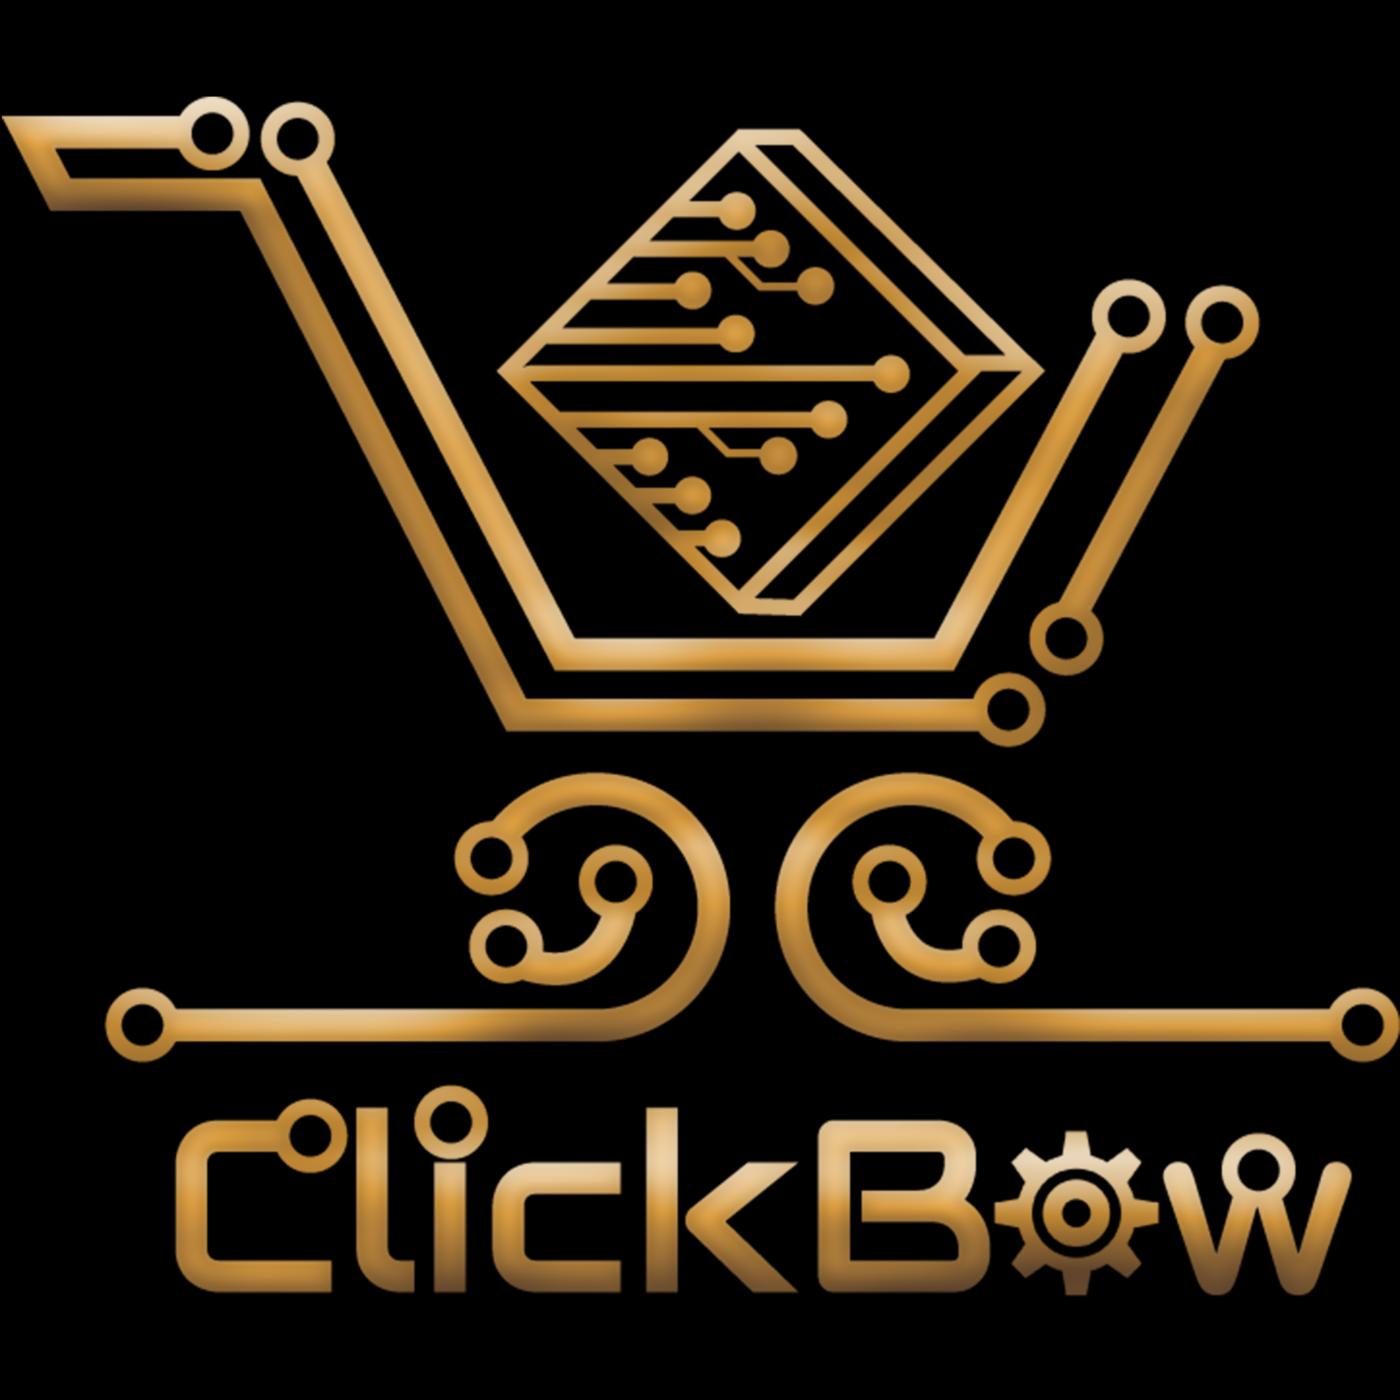 ClickBow